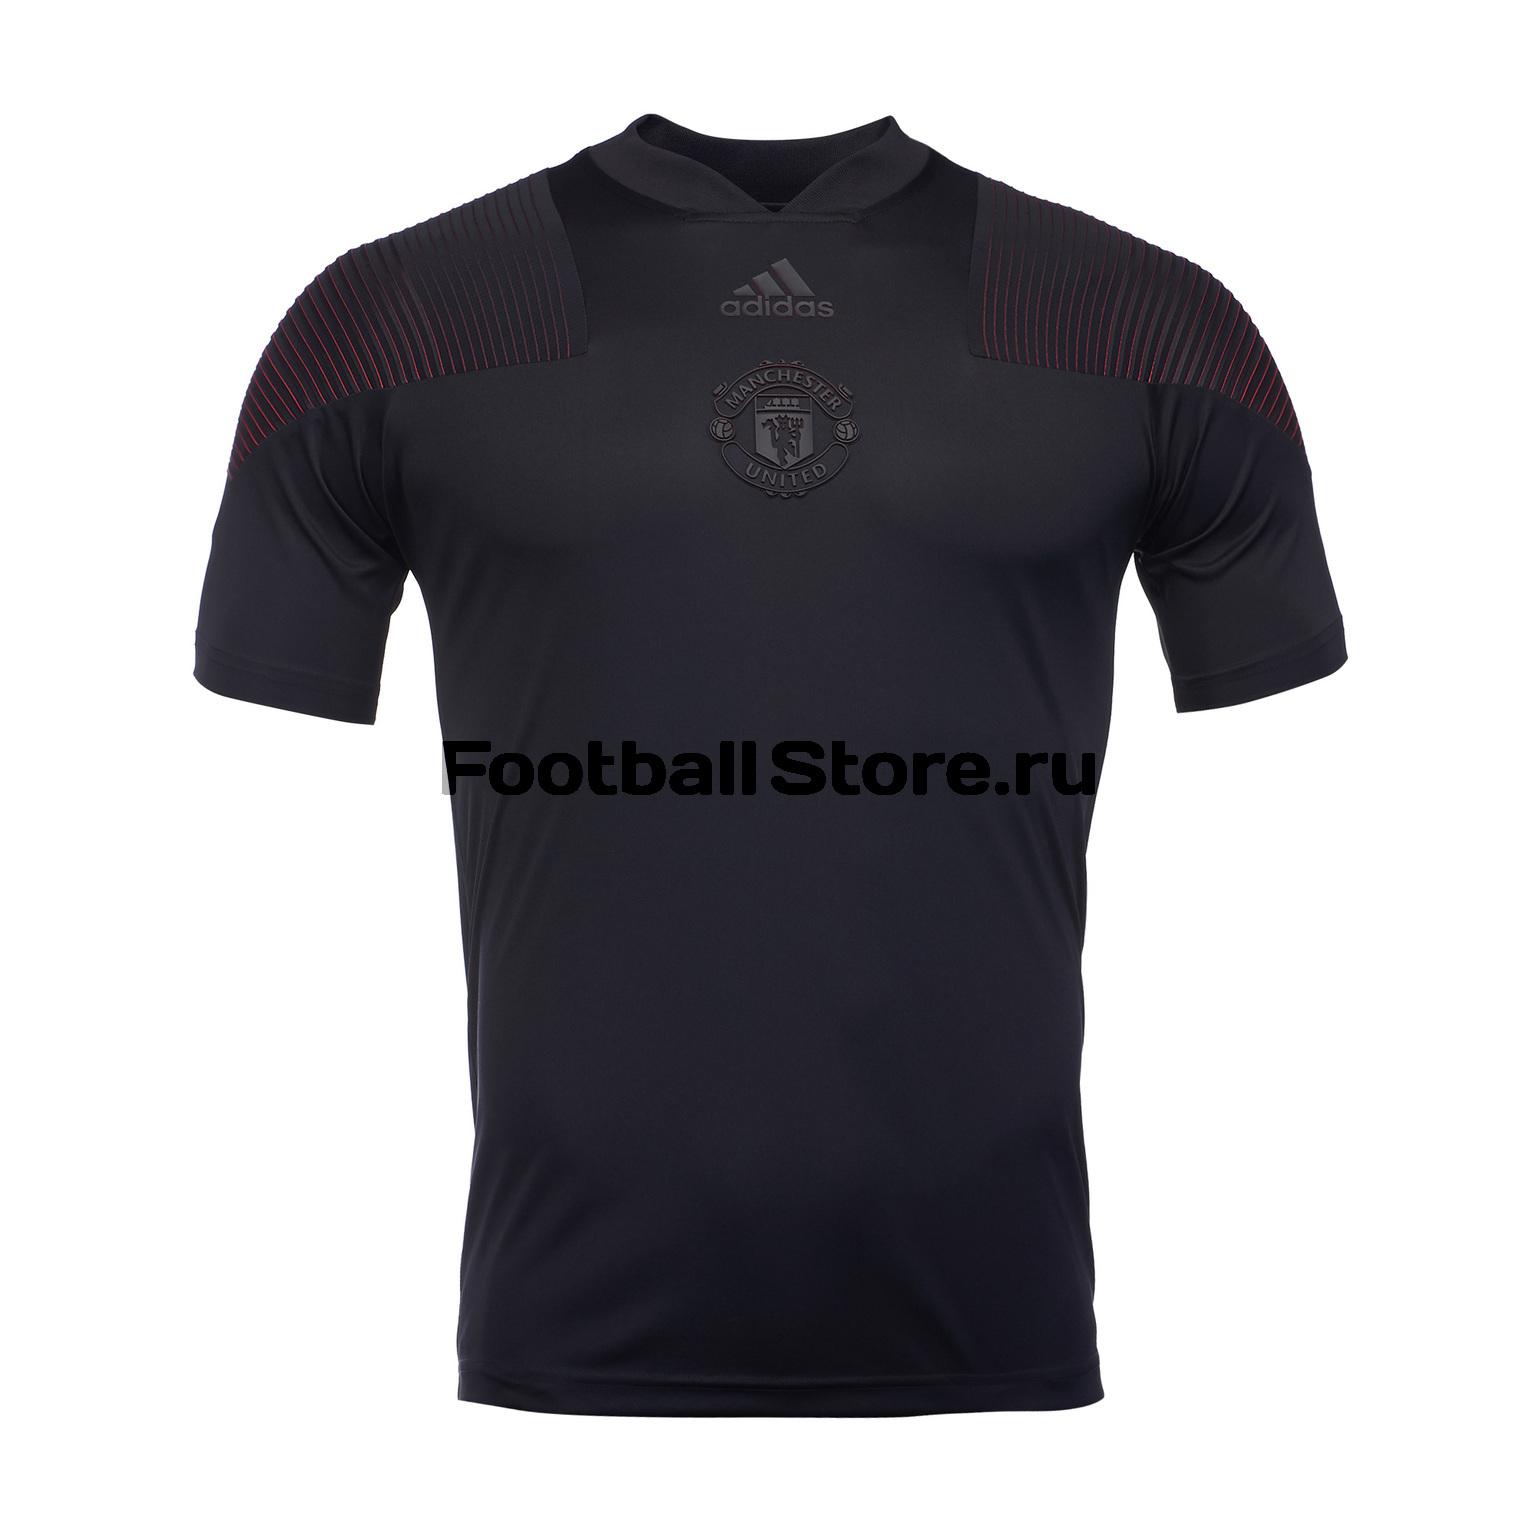 Футболка Adidas Manchester Uniter сезона 2018/19 рюкзак adidas 15